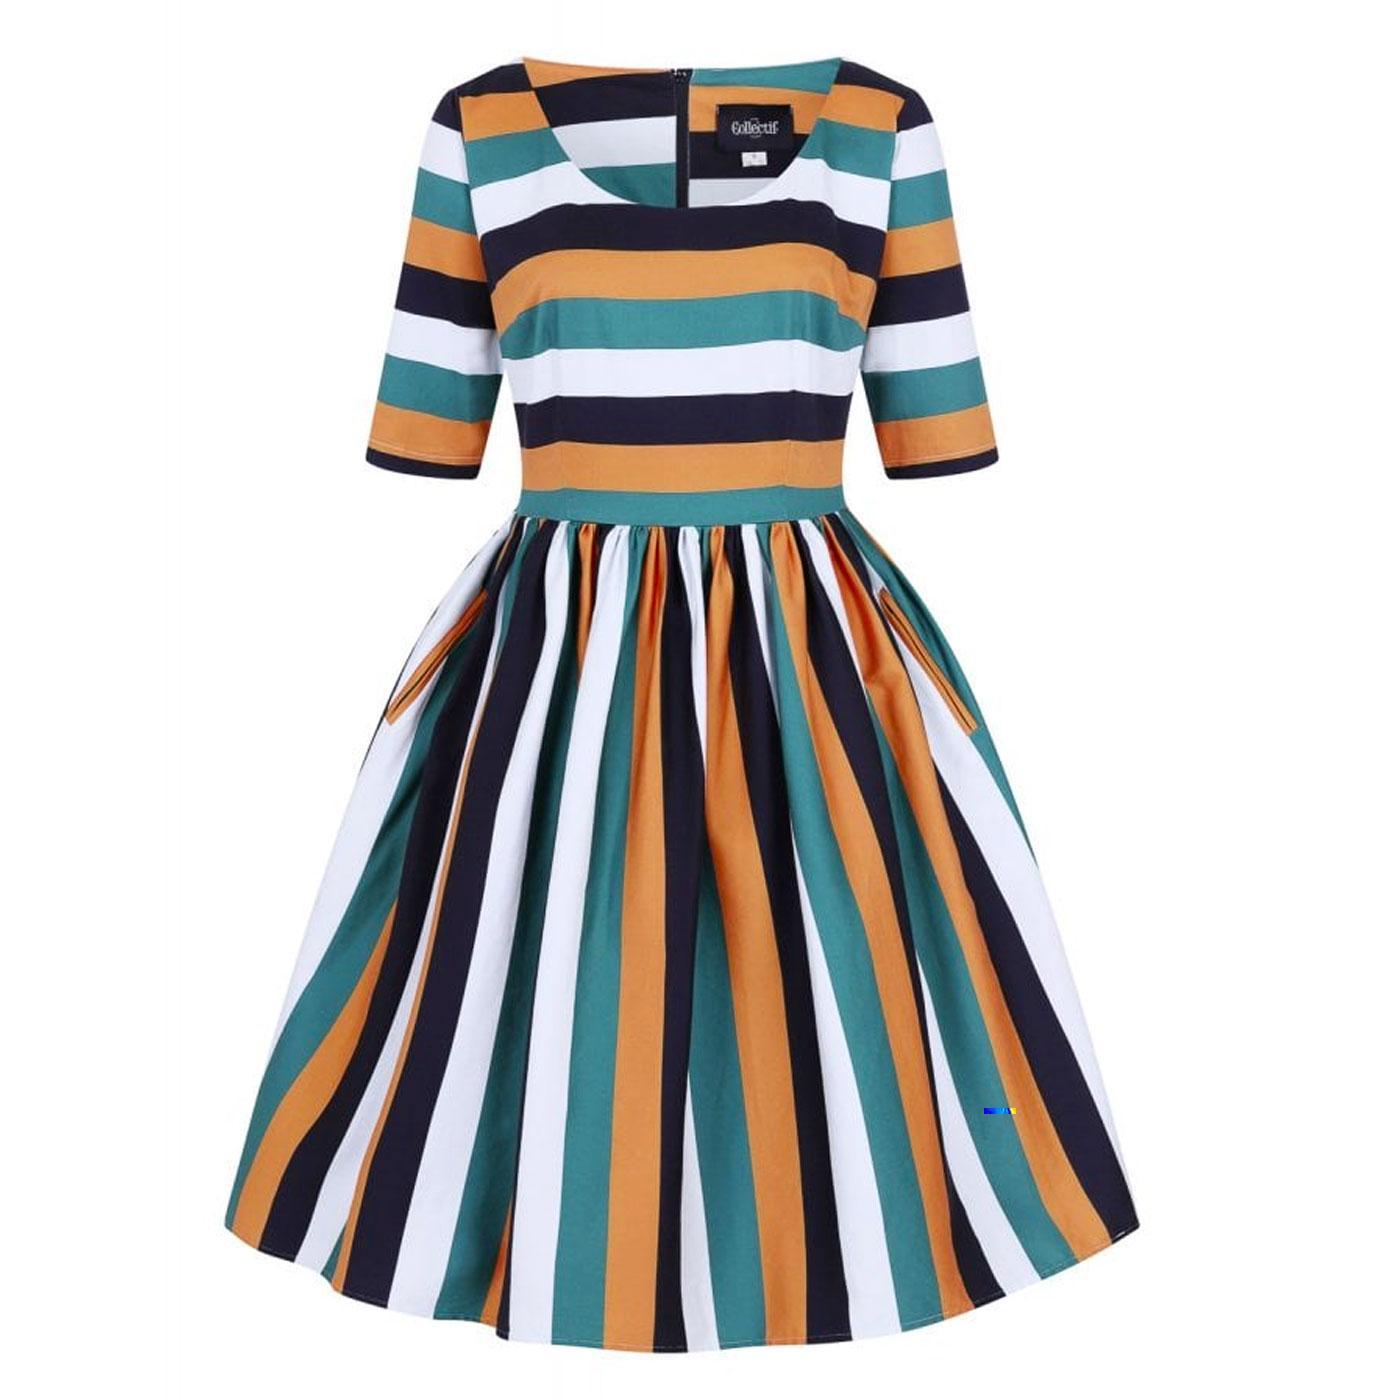 Amber-Lea COLLECTIF Pumpkin Swing Dress